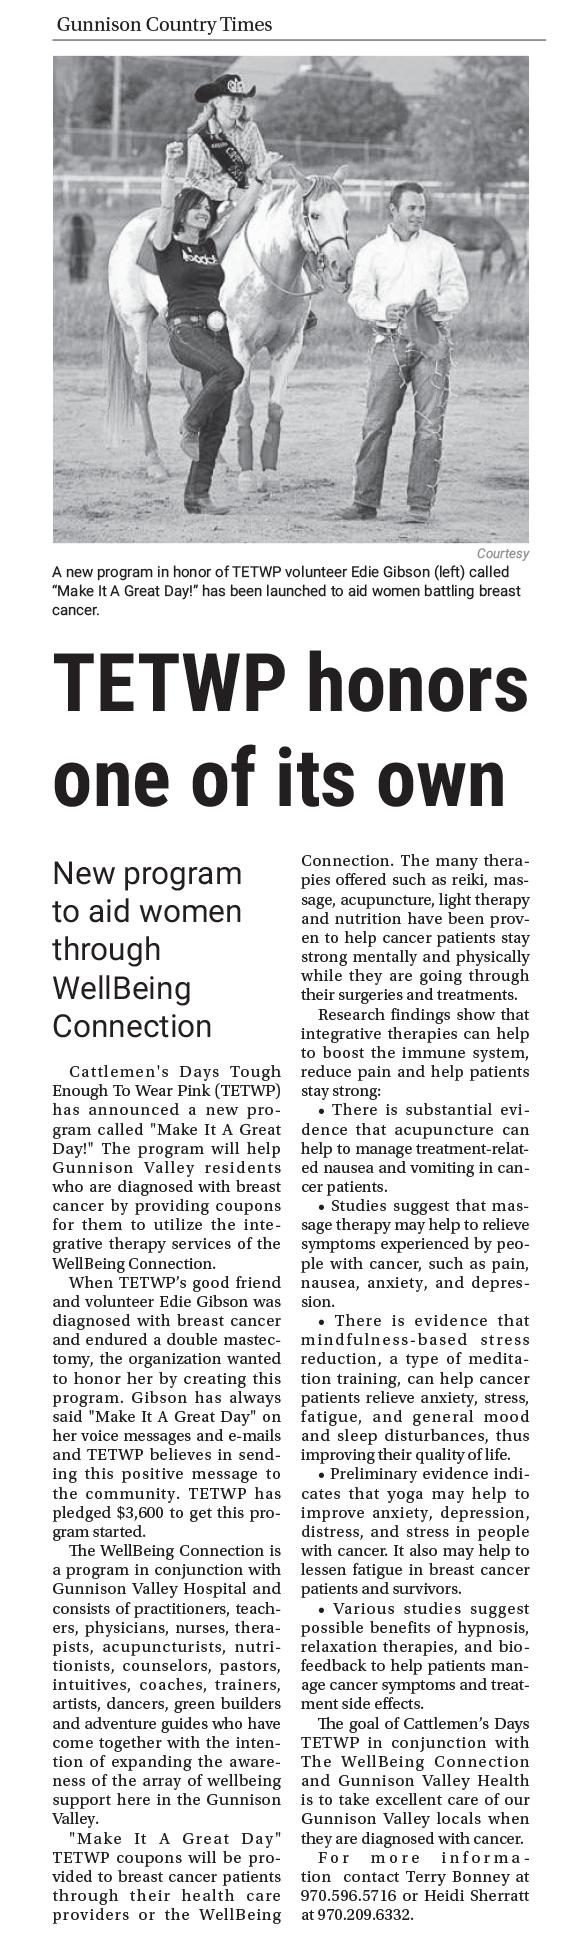 Gunnison Country Times • Thursday, December 1, 2016